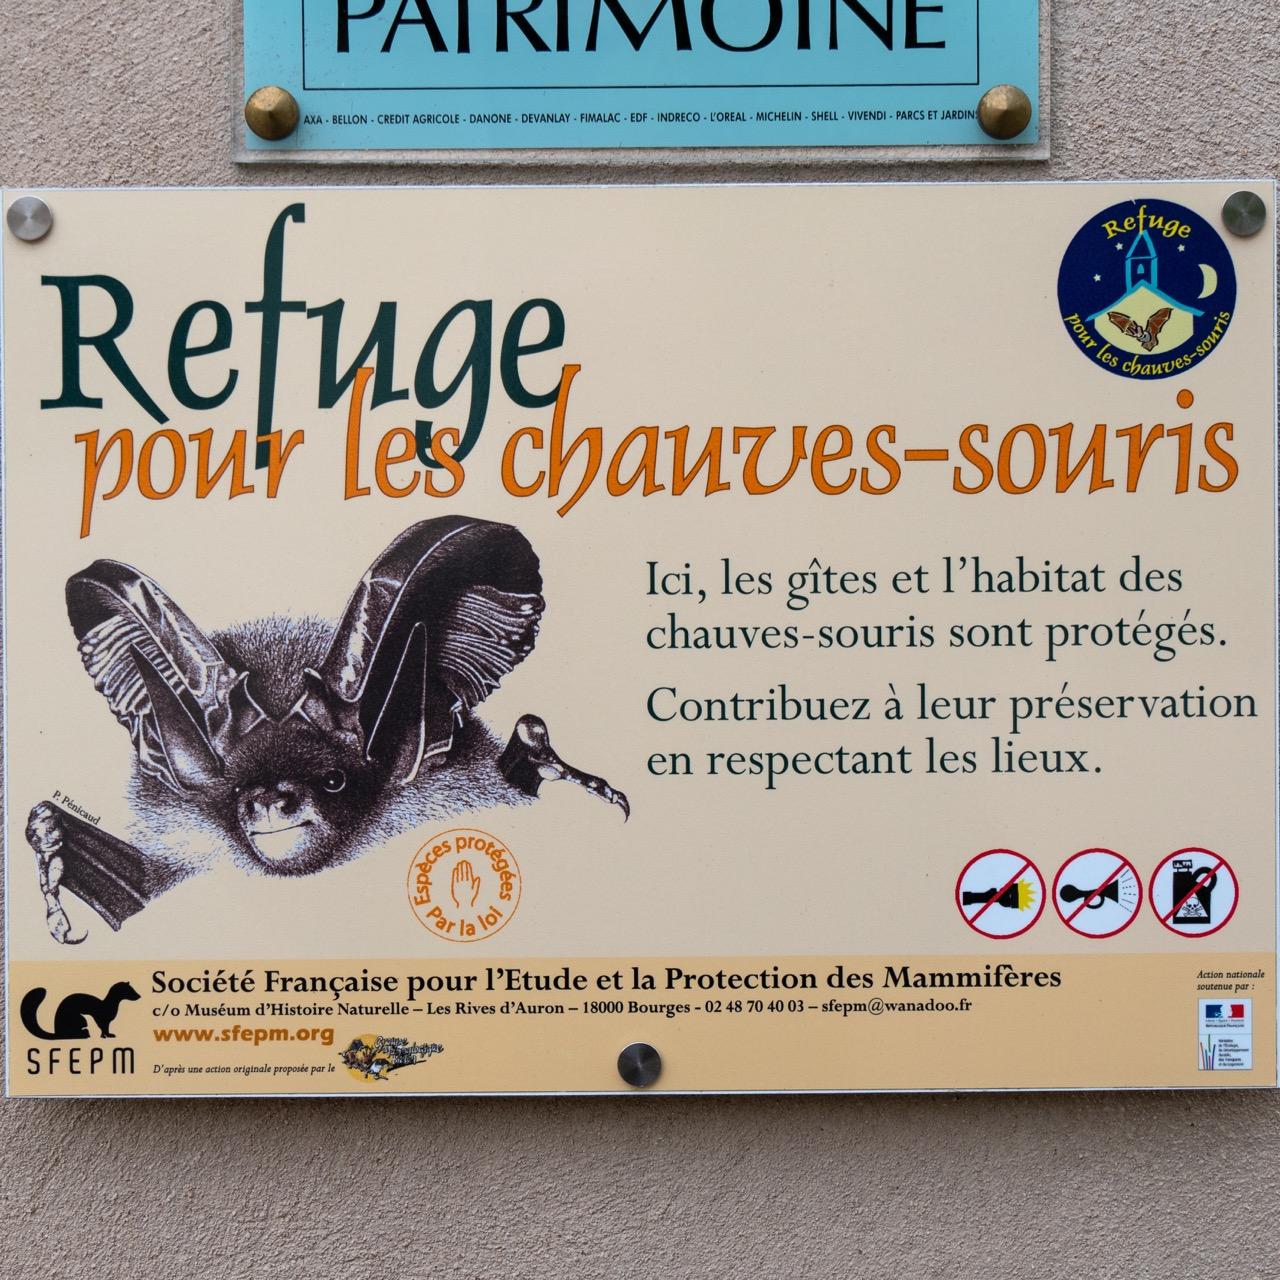 Plakette zum Ausweis der Kirche als Fledermaushabitat